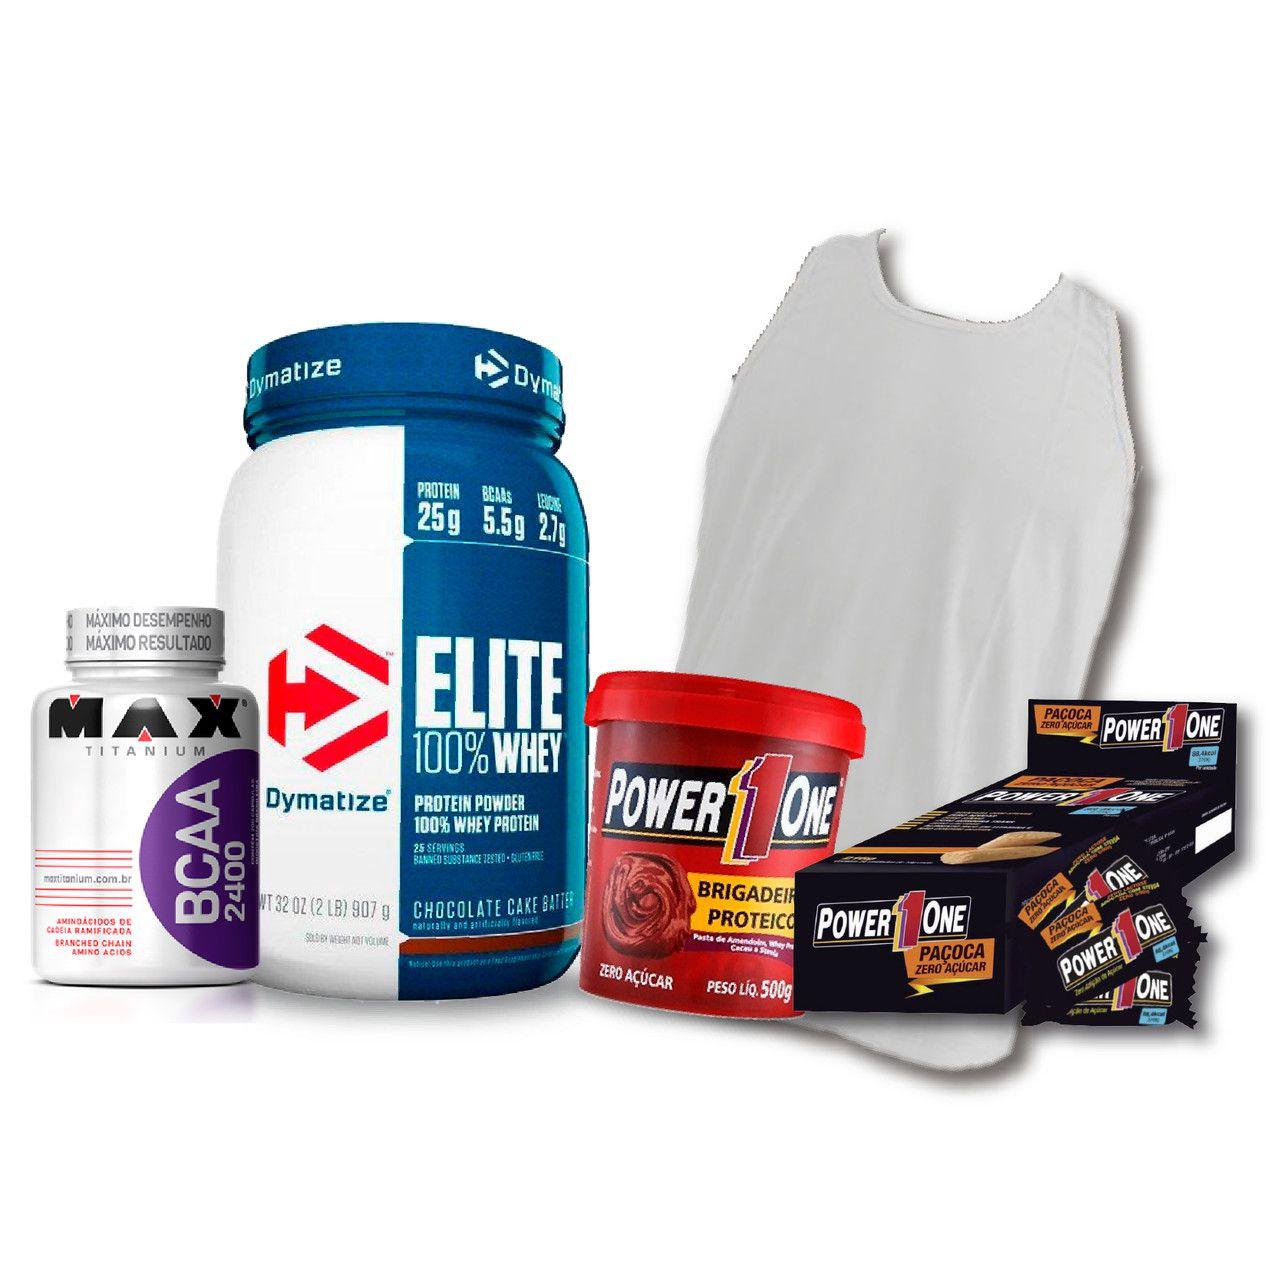 KIT: Elite 100% Whey 2lbs + Camiseta Probiótica + Pasta de Brigadeiro + Caixa de Paçoca + BCAA 2400